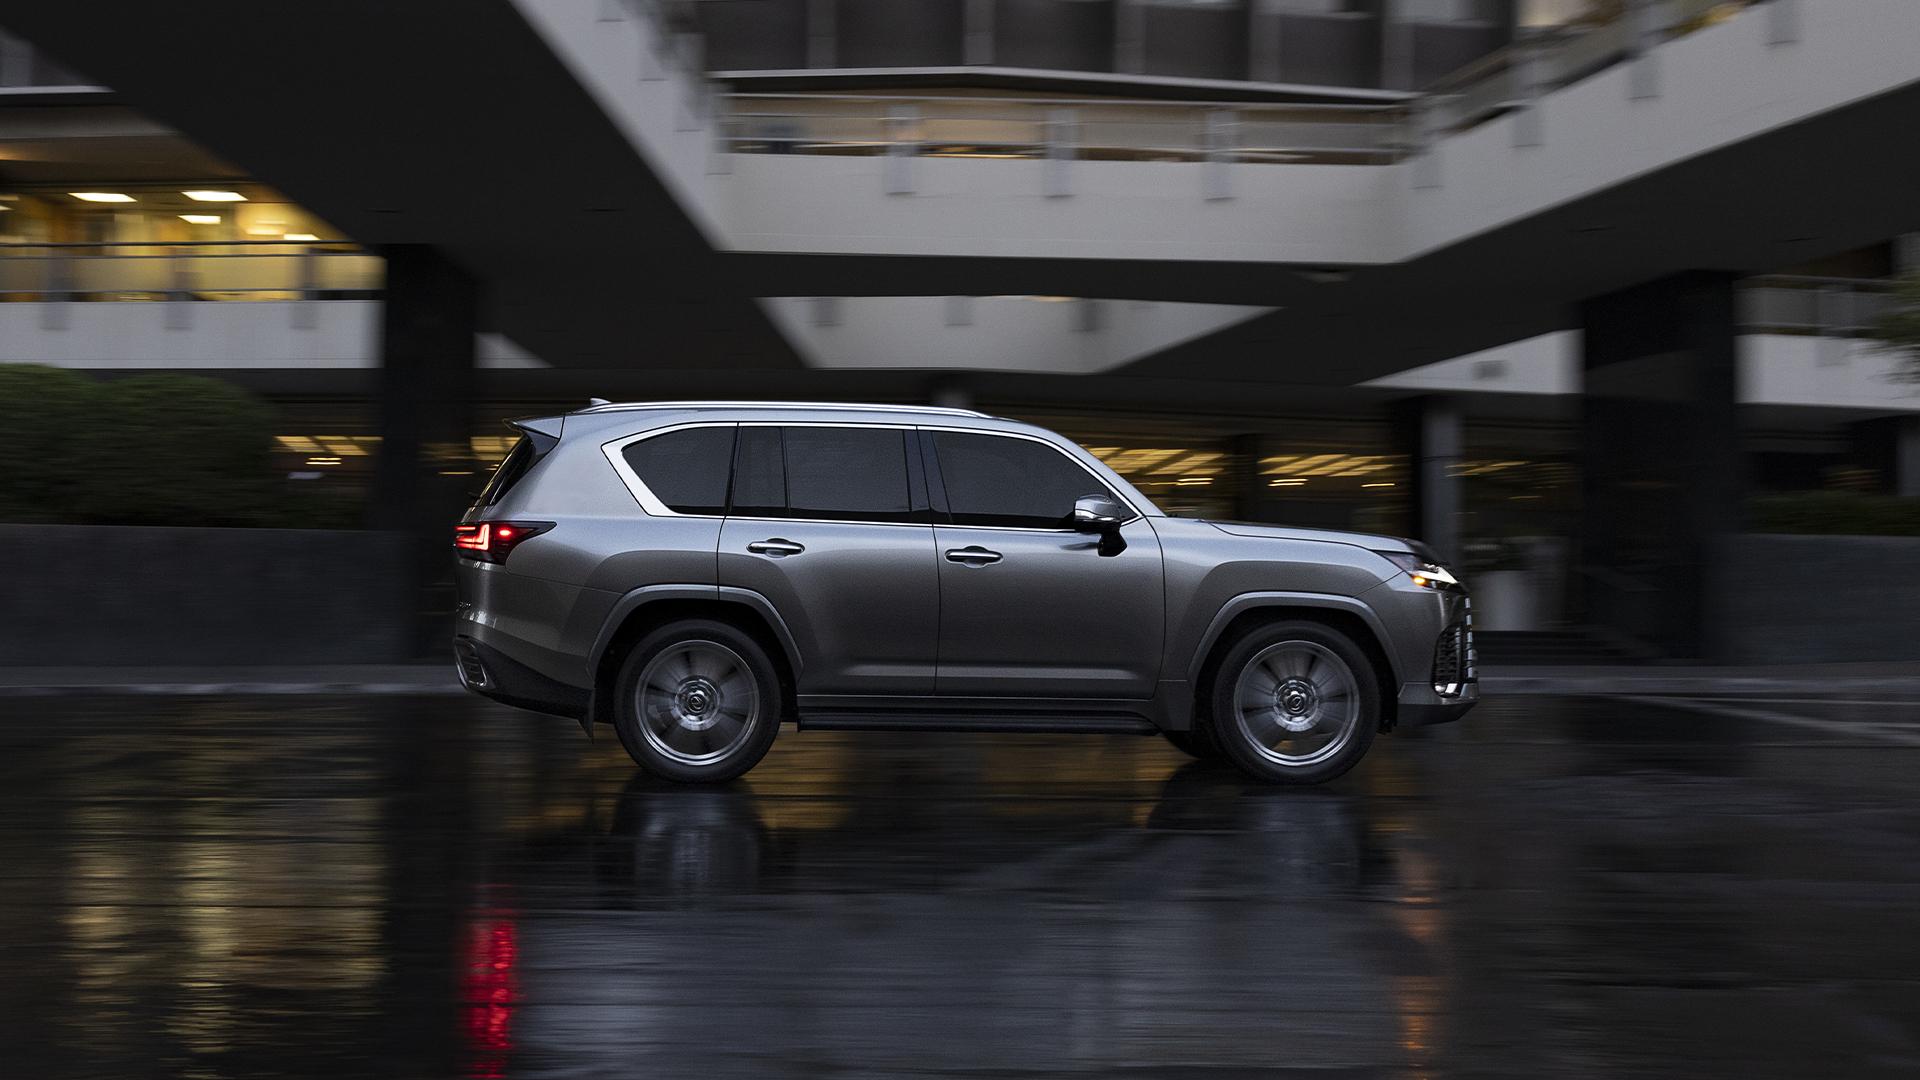 2022 Lexus LX 600 side profile action urban